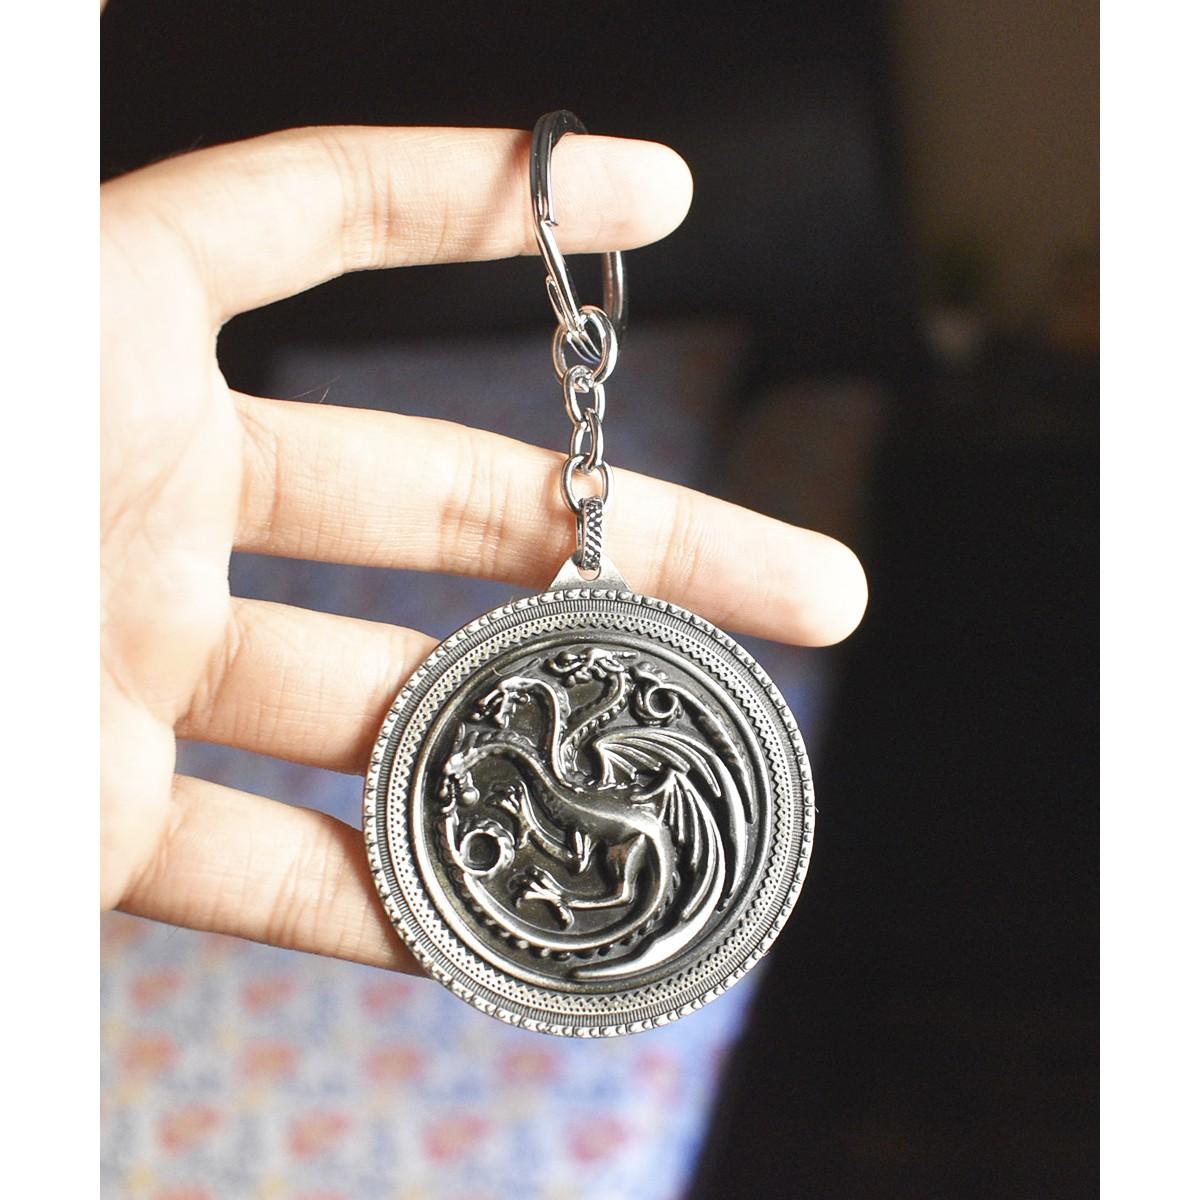 GOT Targaryen House Targaryen 3 Dragon - Metal Keychain - Original HBO Inc. Merchandise